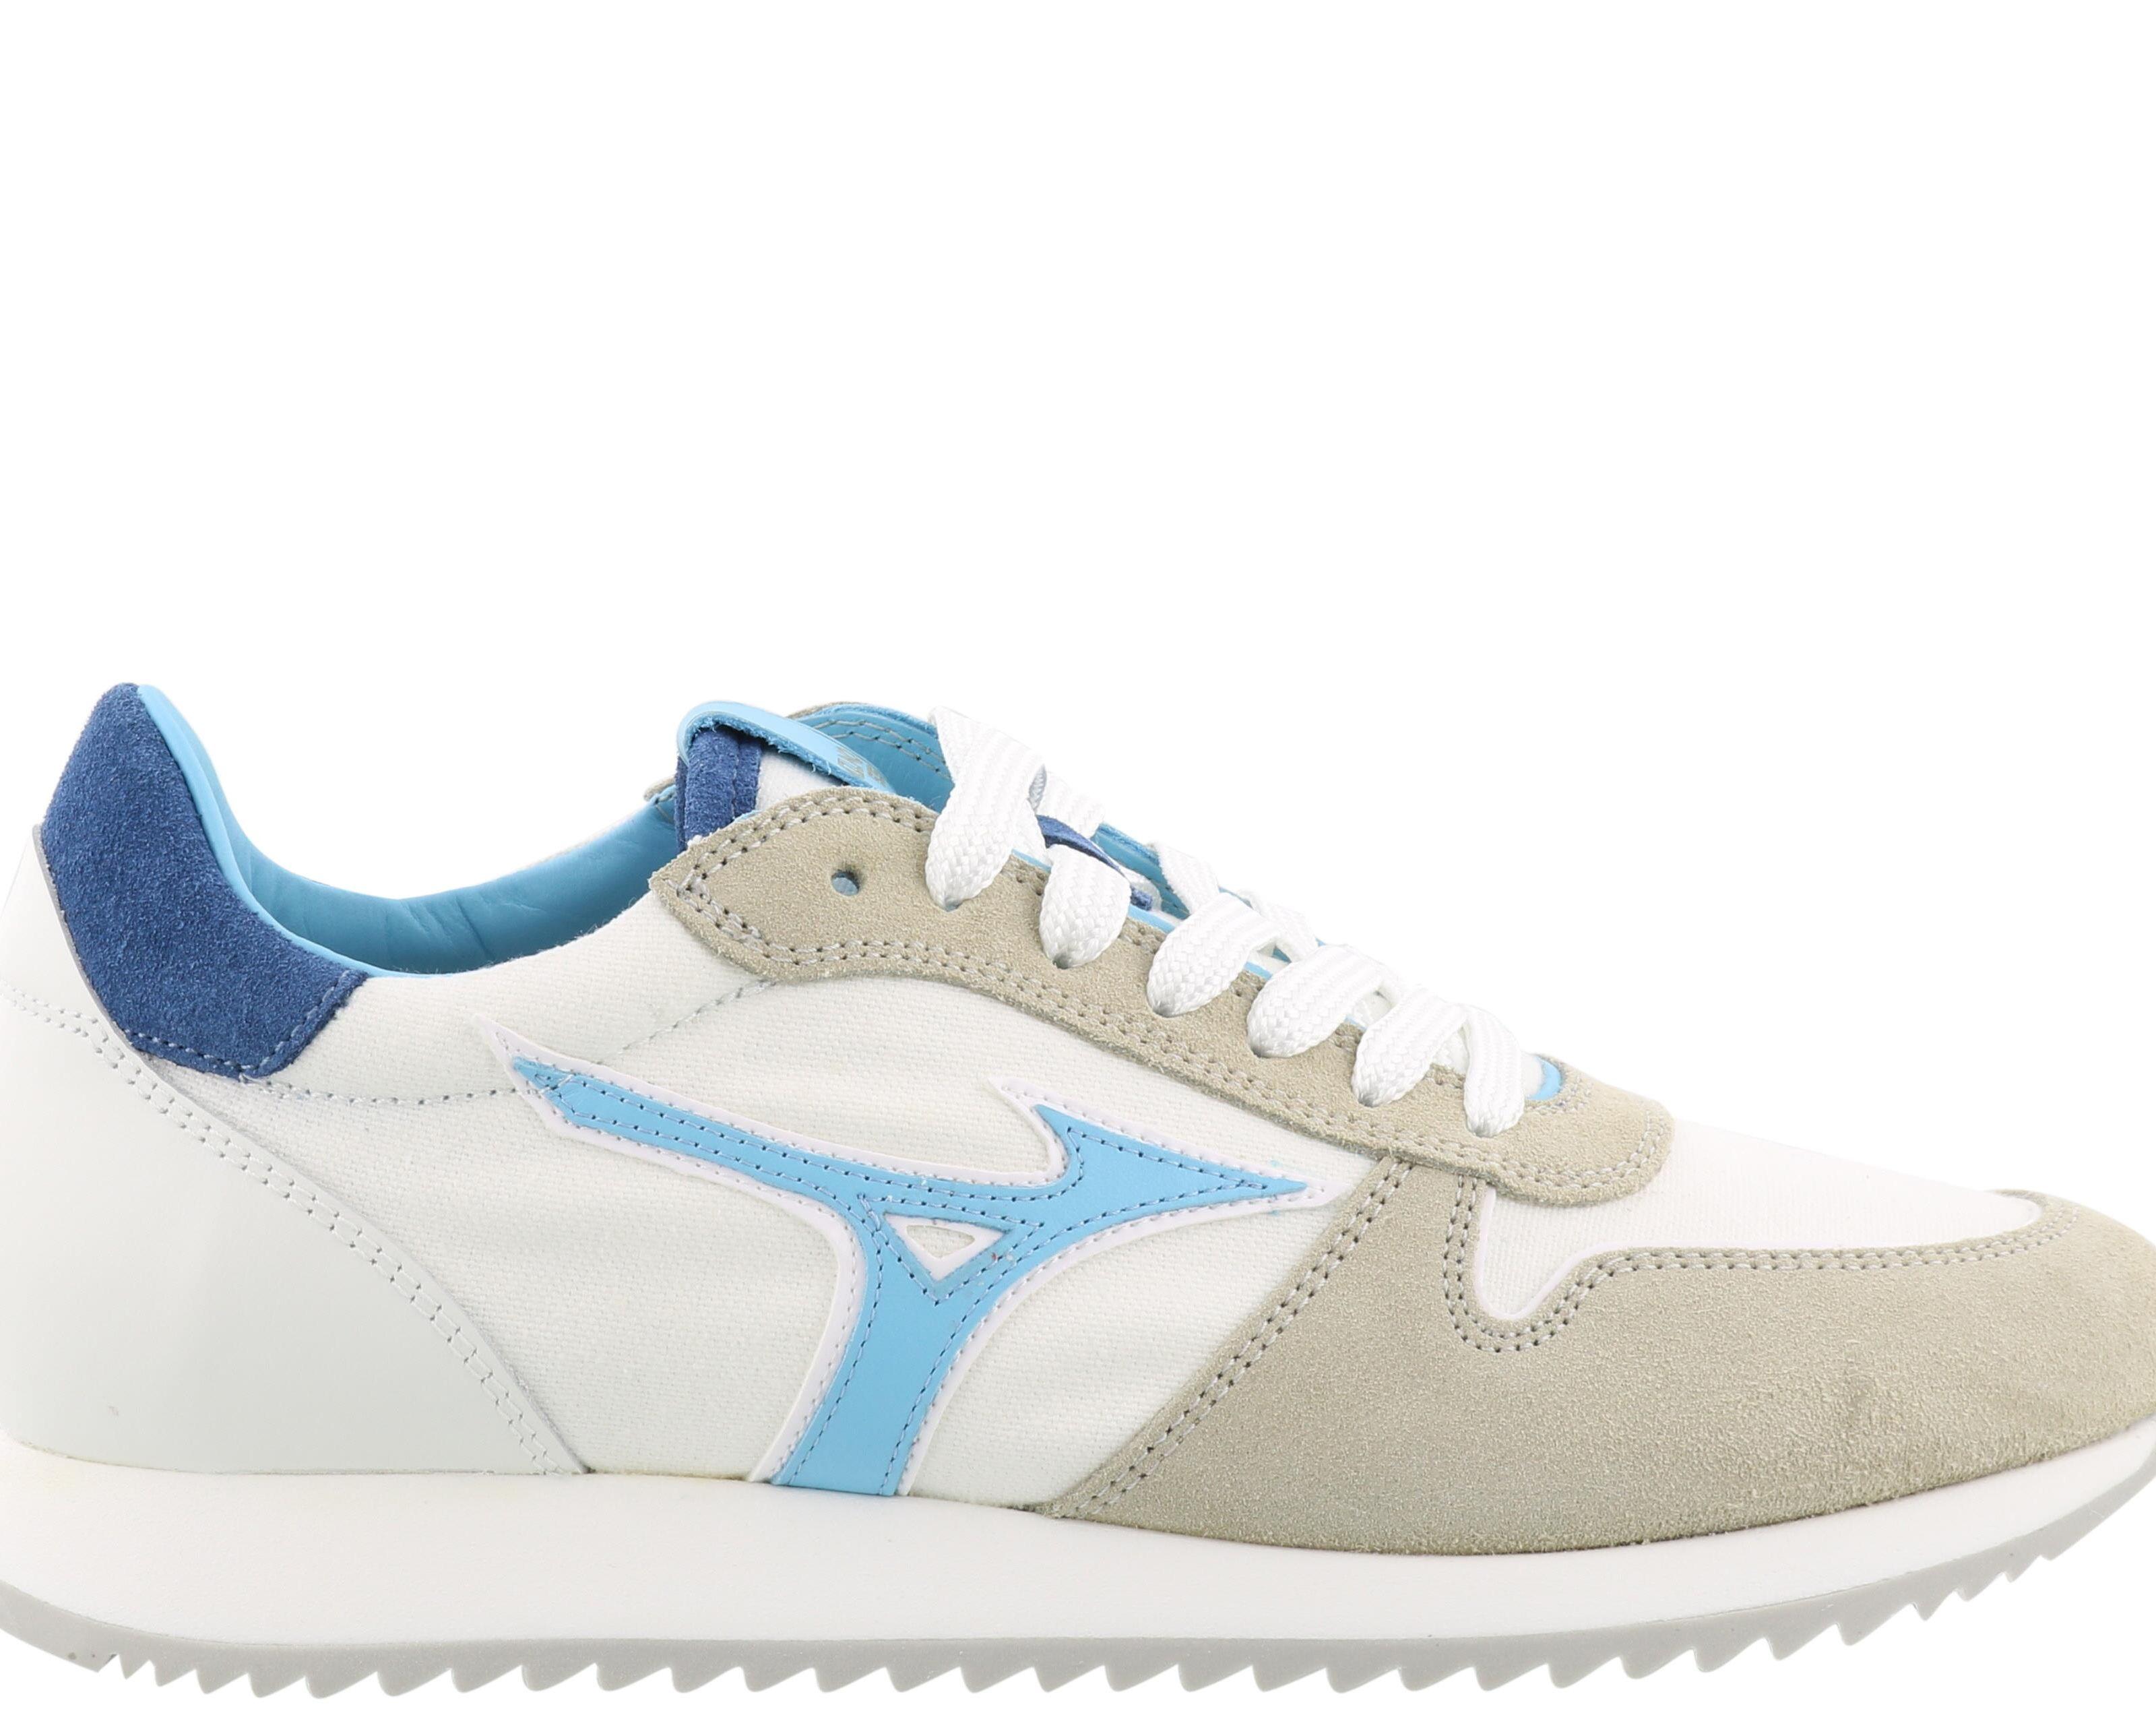 Mizuno 1906 Etamin Sneakers